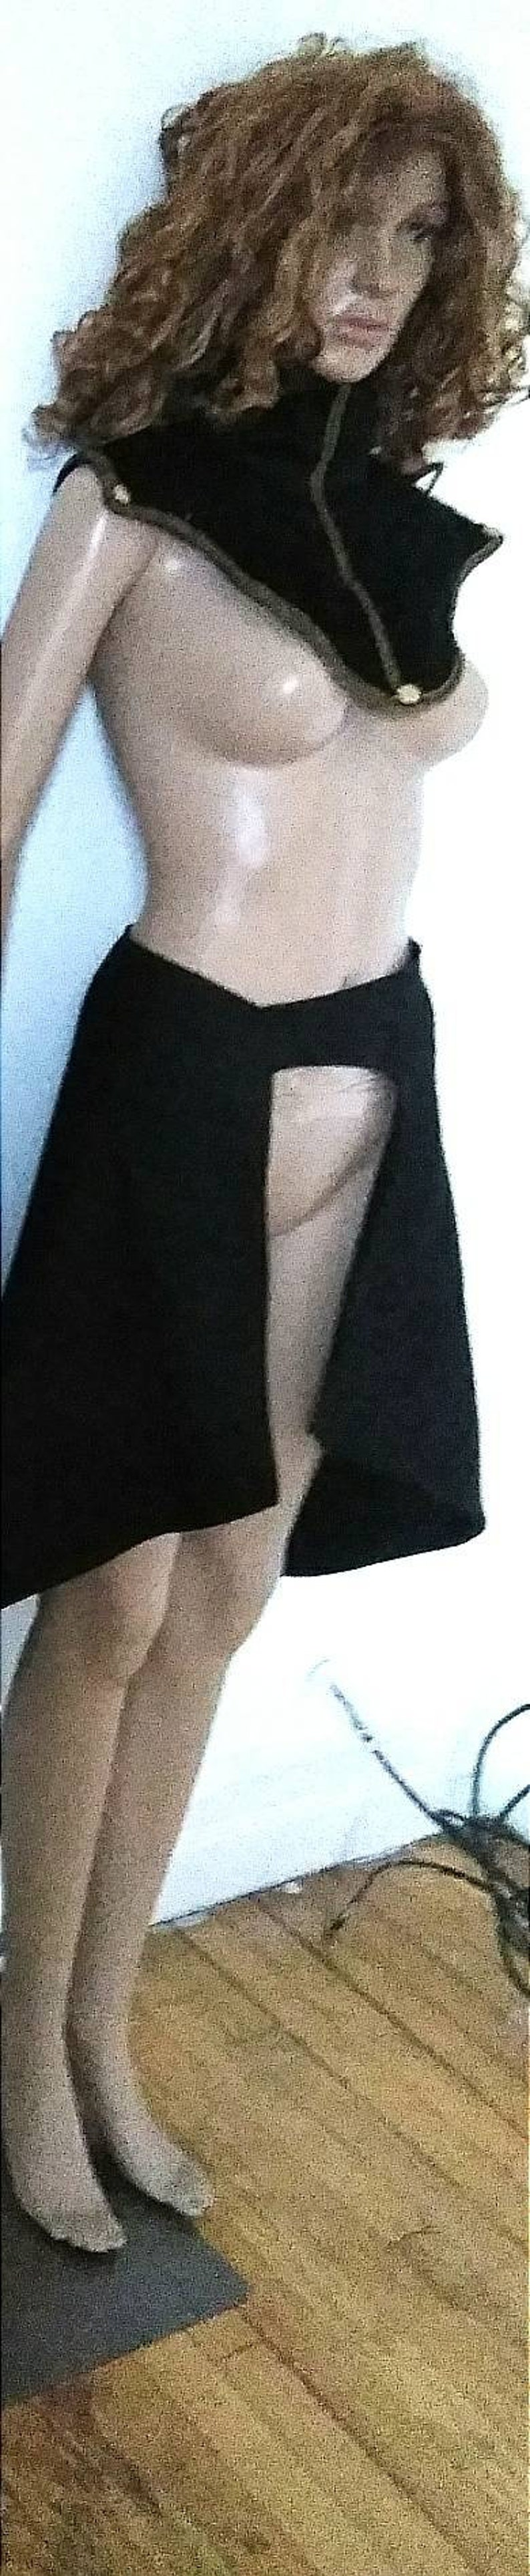 Style 4 High Collar-Shoulder Accessory SHURI  STYLE NECKPIECE